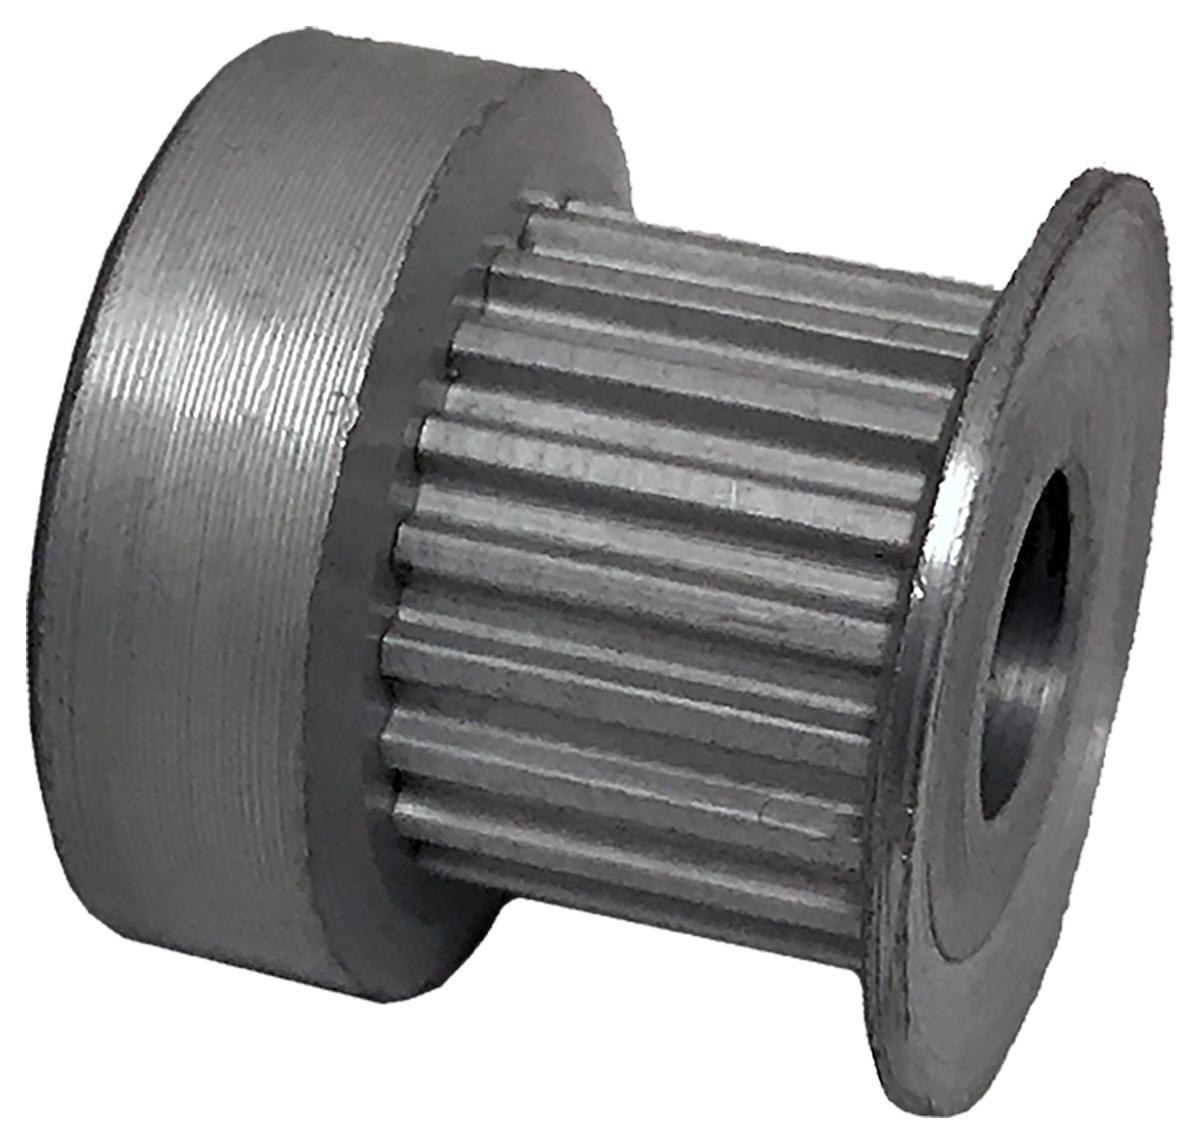 20LT312-6CA3 - Aluminum Imperial Pitch Pulleys